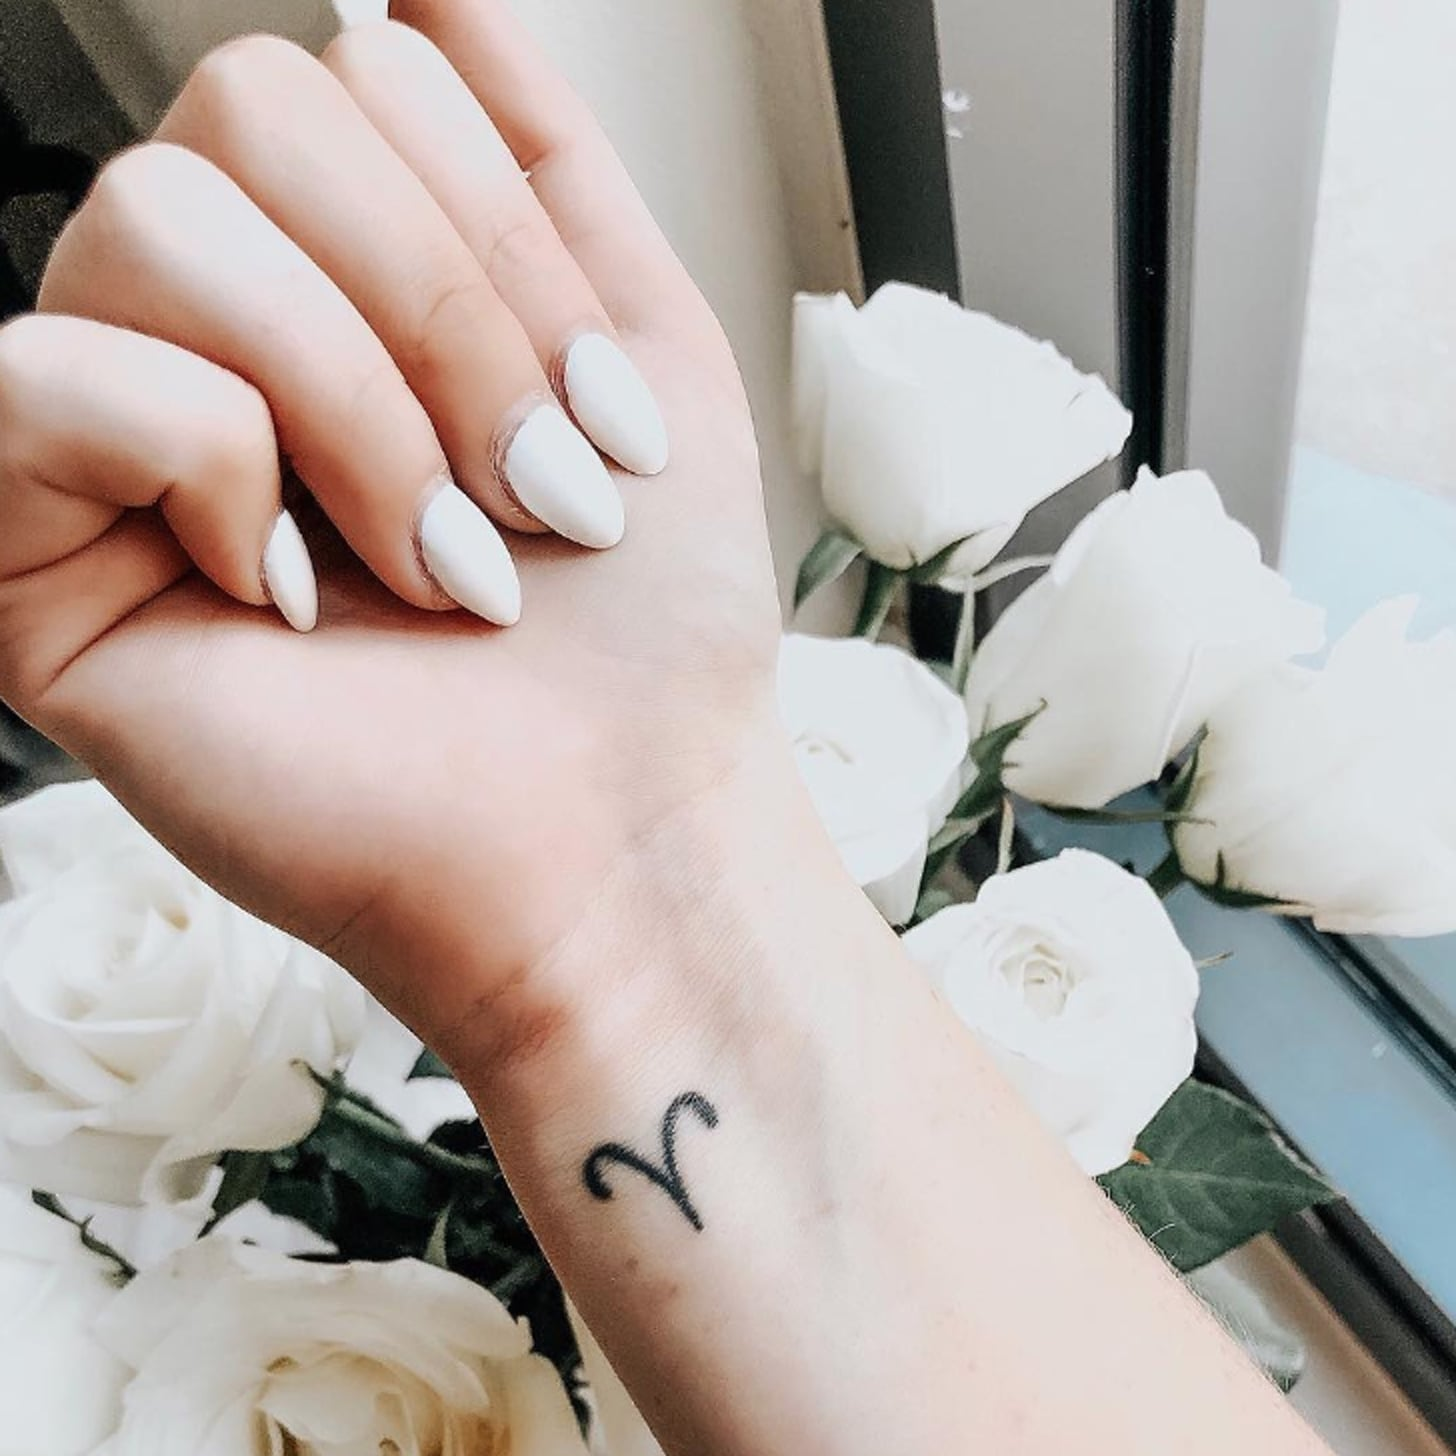 1a7c8c726 Zodiac Sign Tattoo Ideas | POPSUGAR Love & Sex